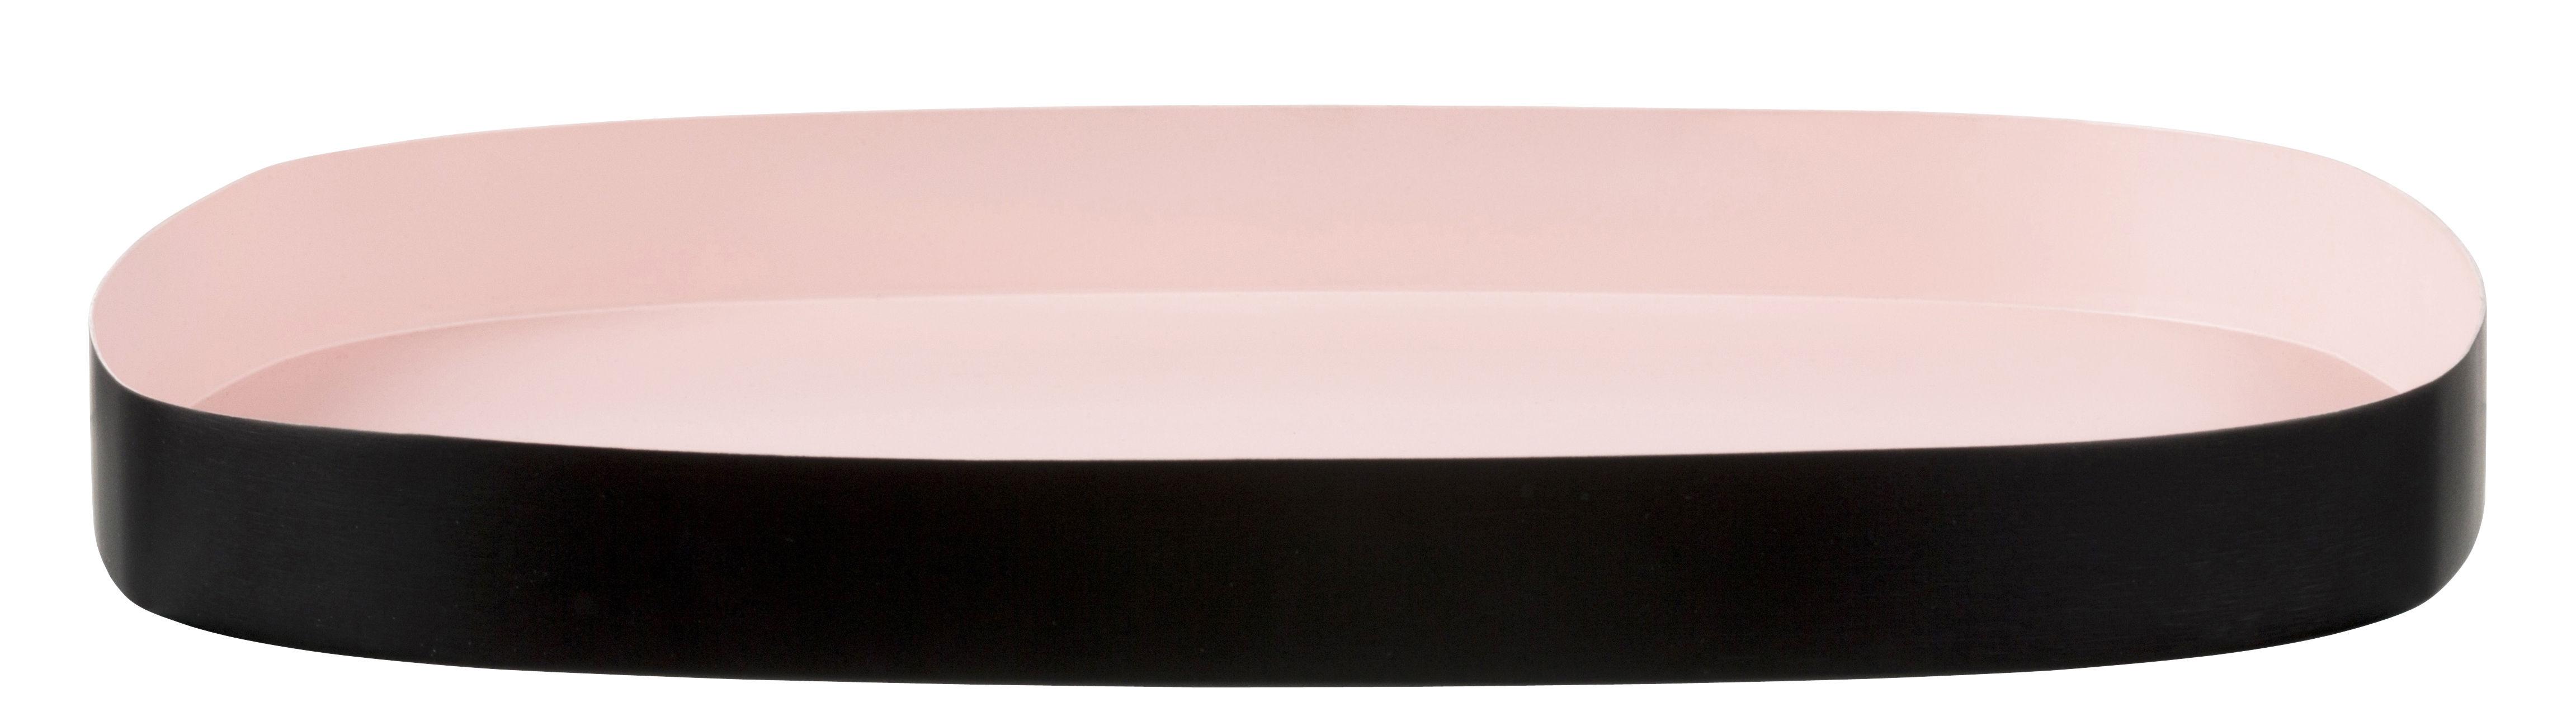 plateau television large 33 x 29 cm rose noir design letters. Black Bedroom Furniture Sets. Home Design Ideas